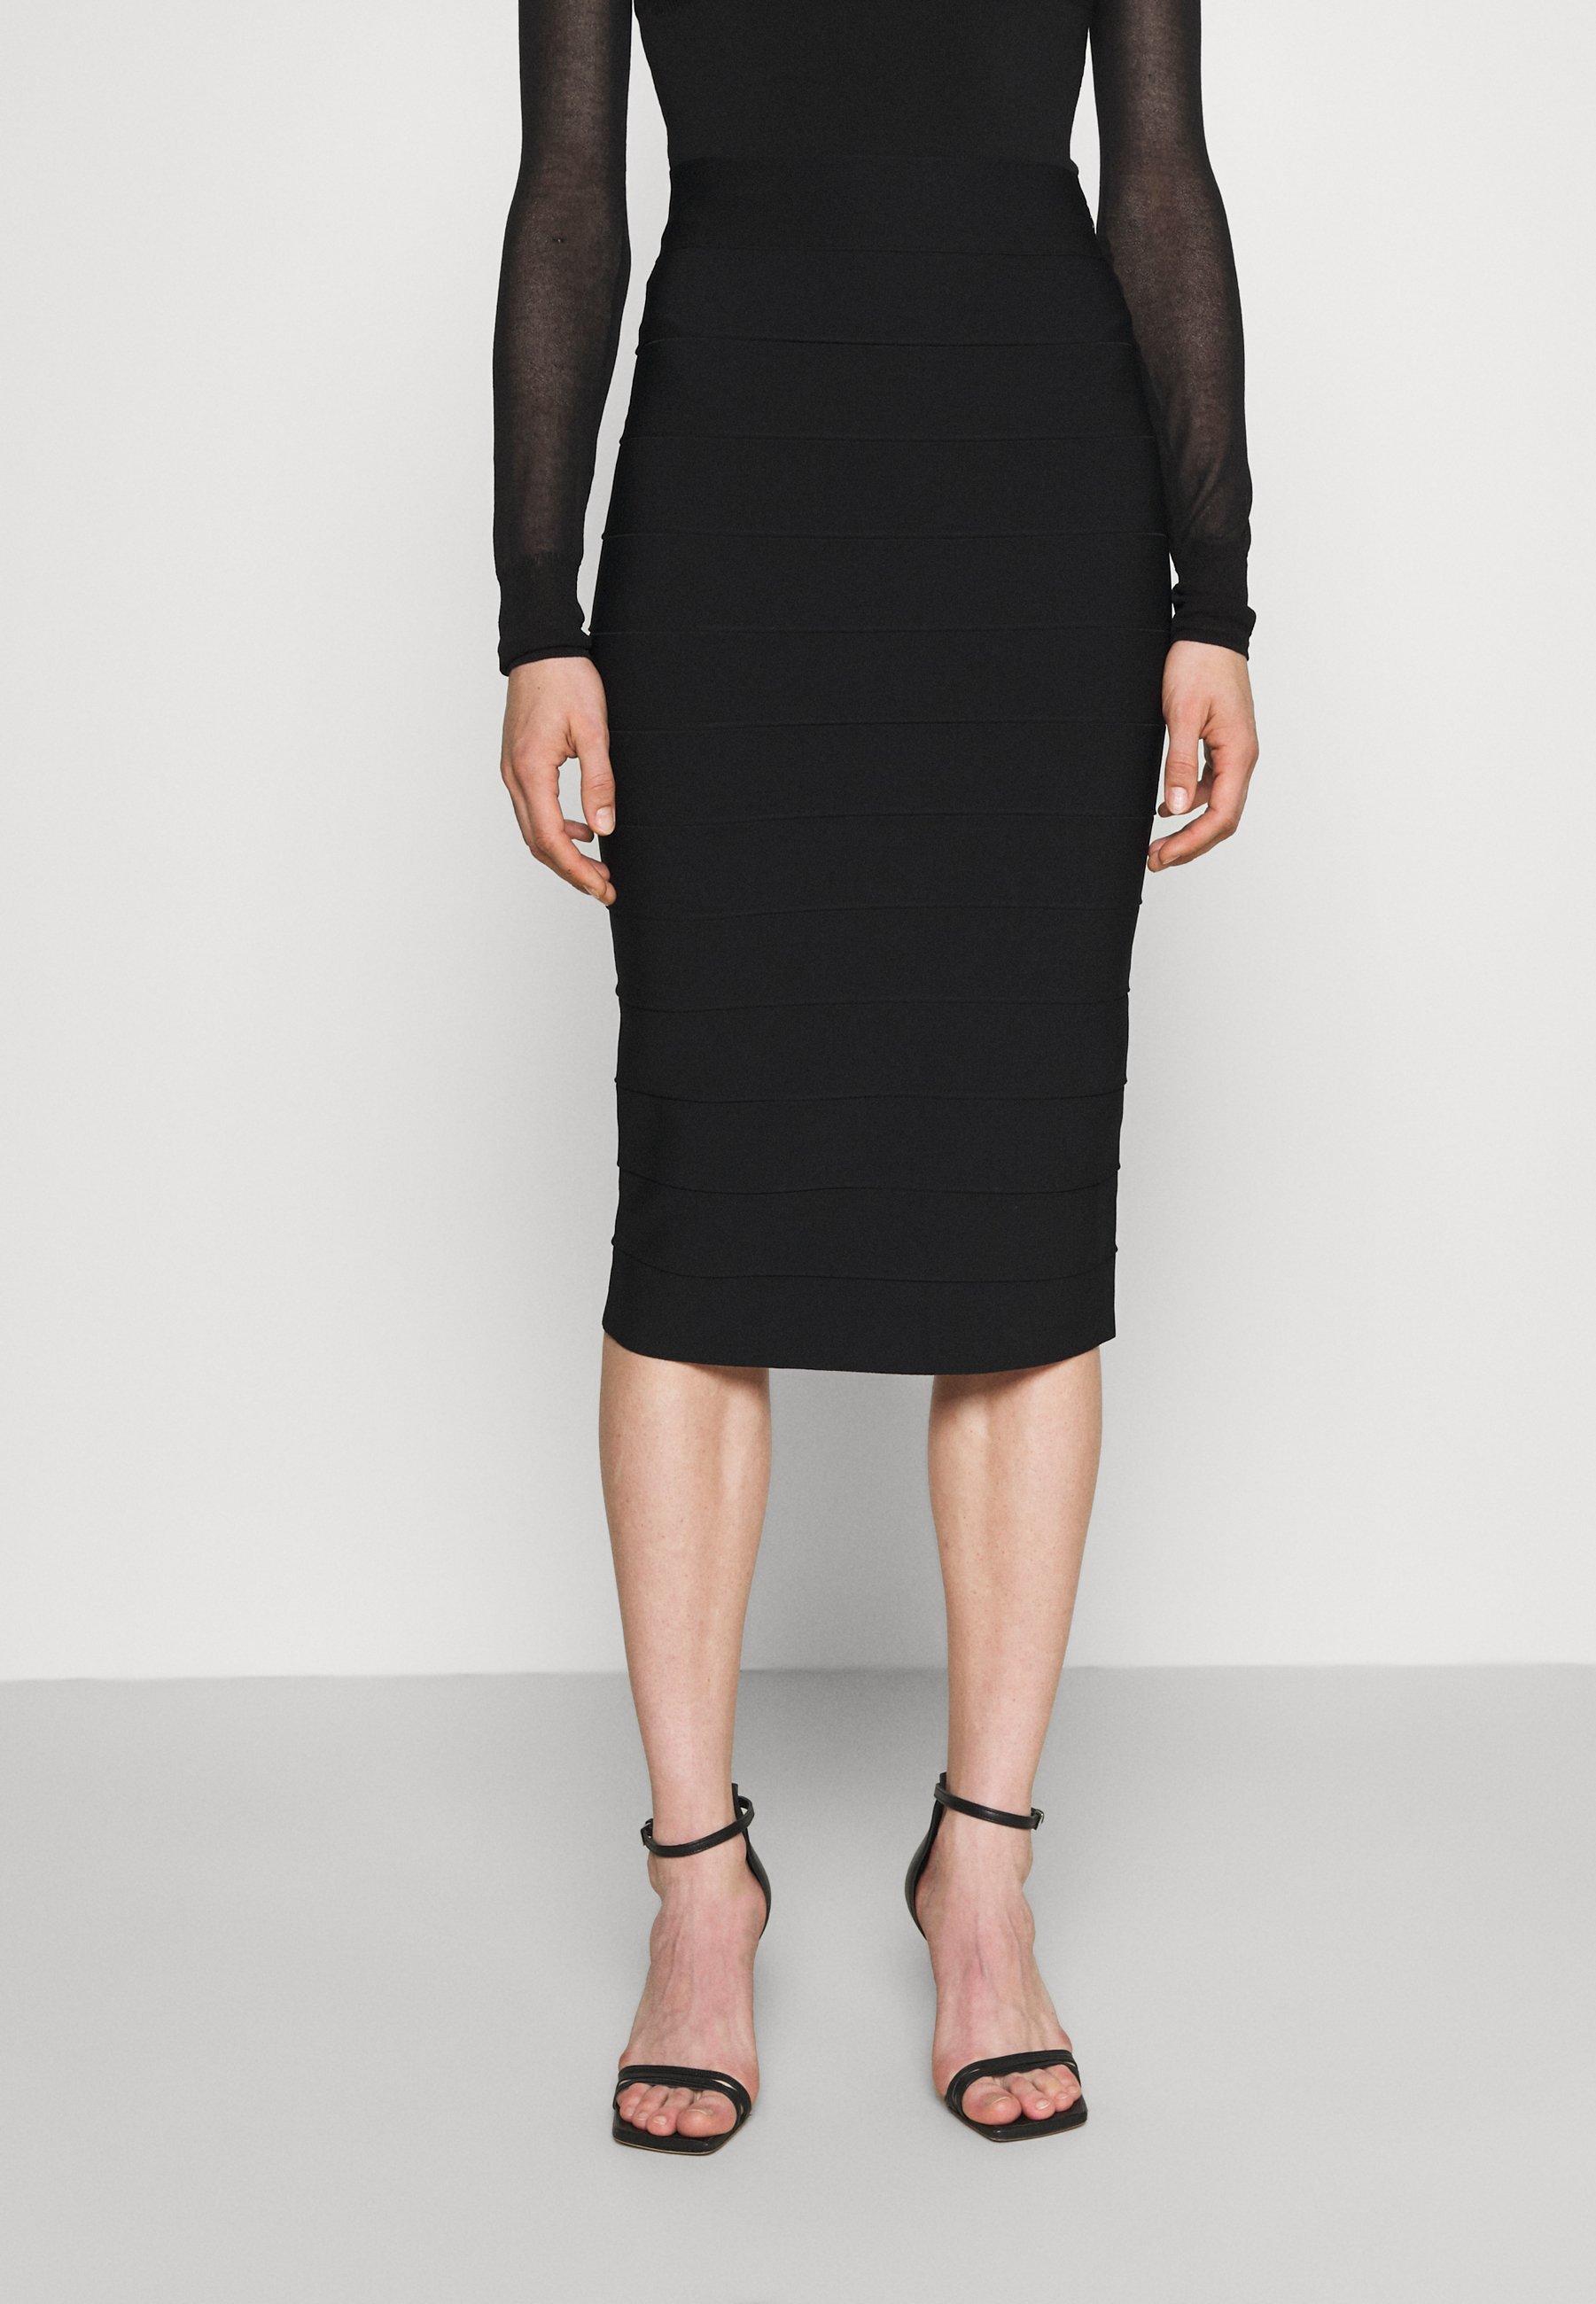 Women HERVE LEGER X JULIA RESTOIN ROITFELD PENCIL SKIRT - Pencil skirt